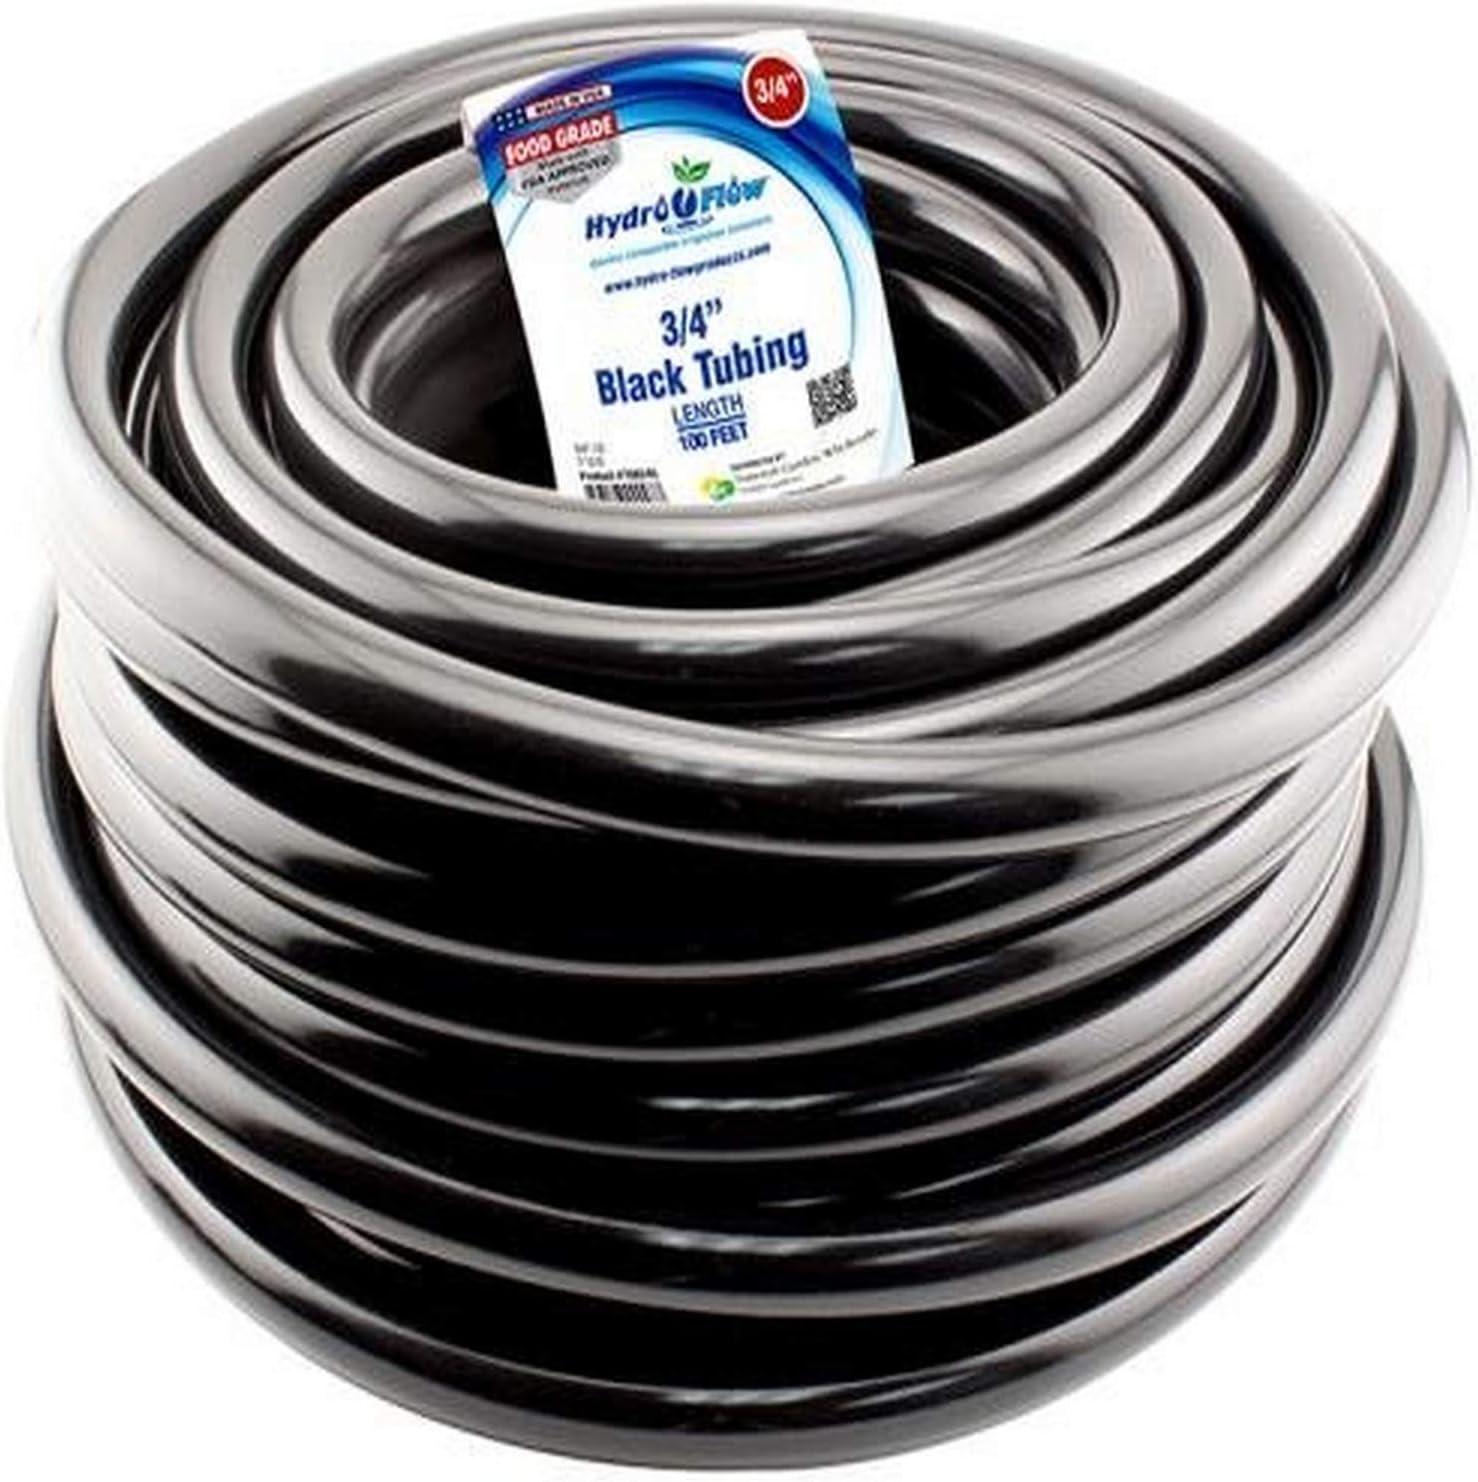 Hydro Flow 100 ft Roll Vinyl Tubing Black 3 OD 1